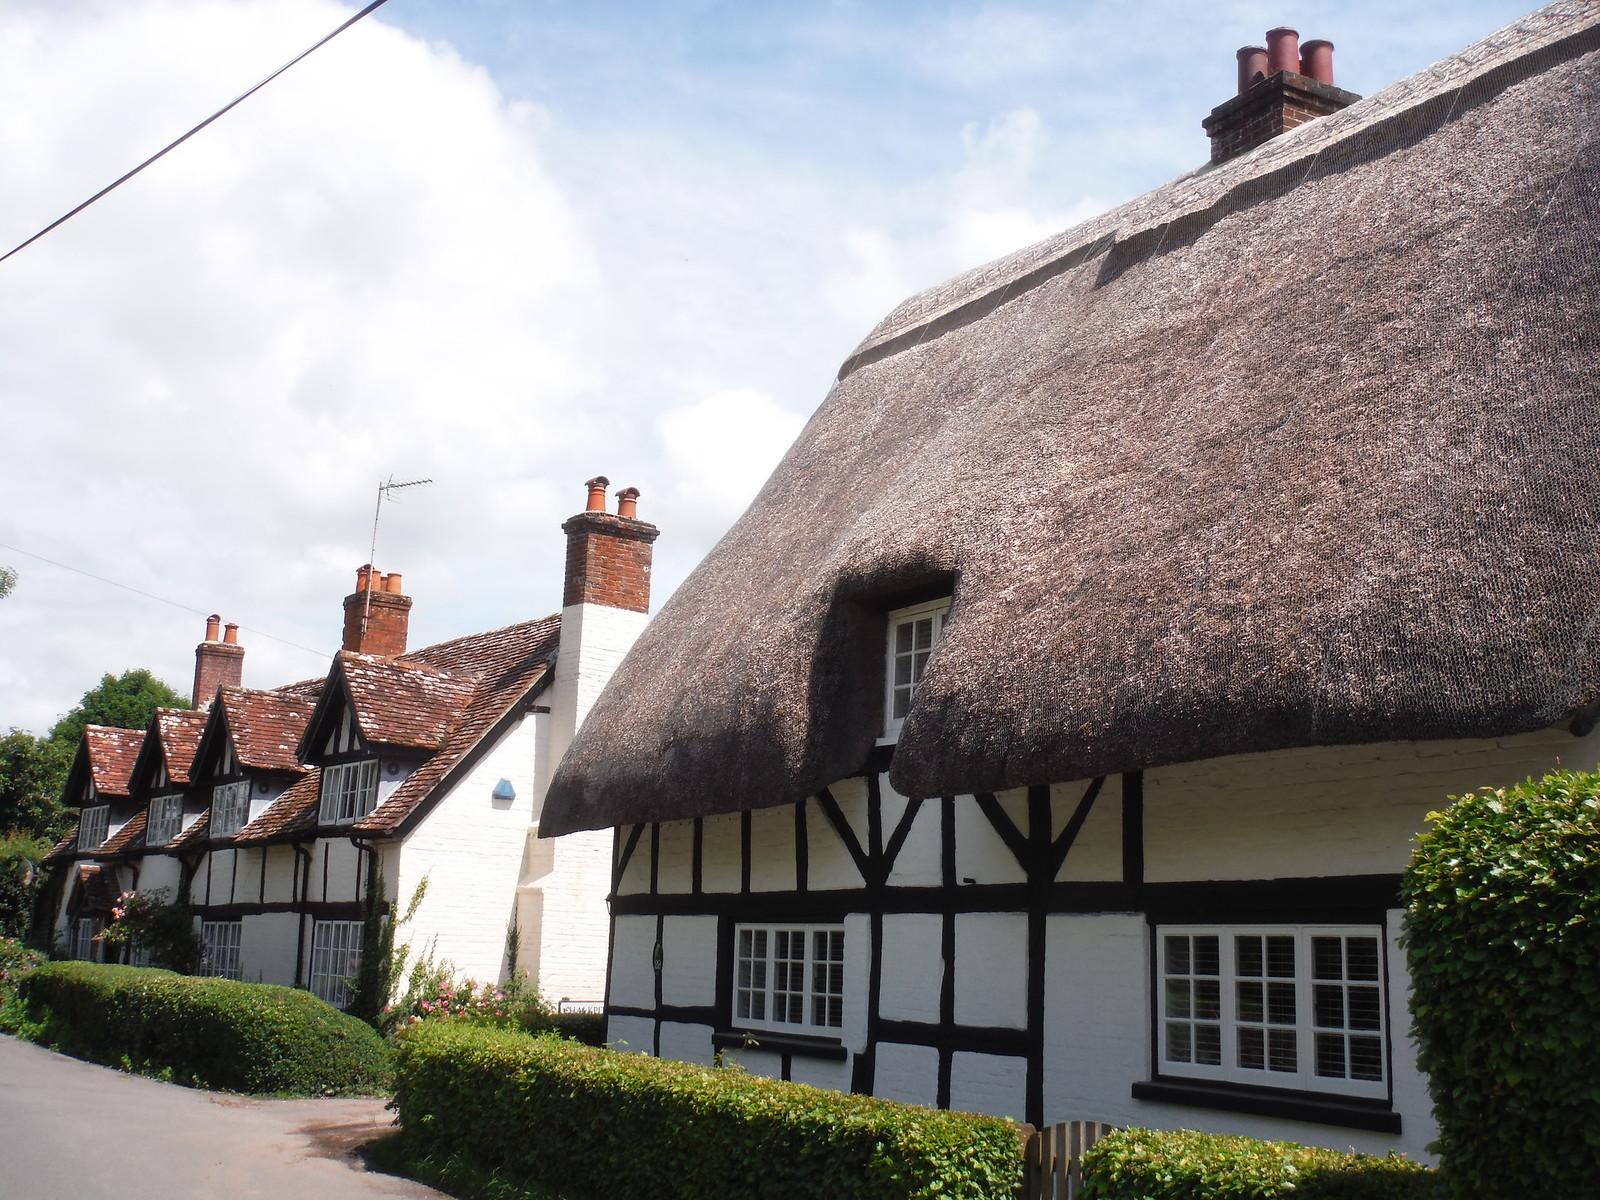 Jessam Cottage, West Tytherley SWC Walk 265 - Dean to Mottisfont & Dunbridge